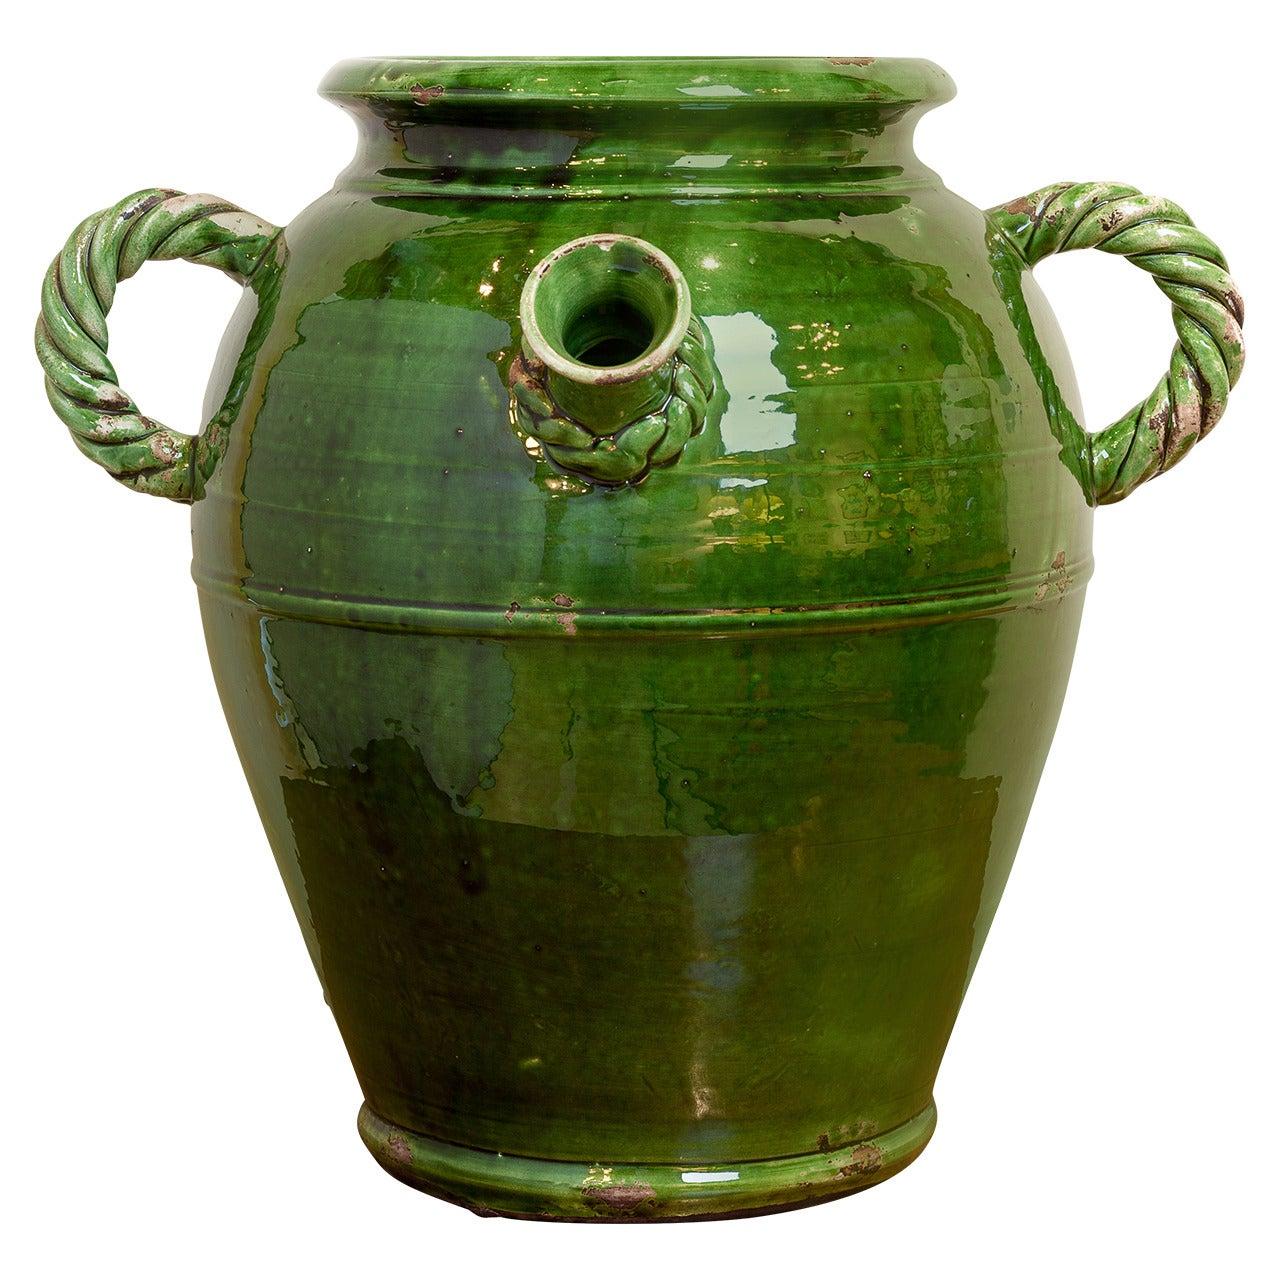 French Provençal Storage Jar, Late 19th Century